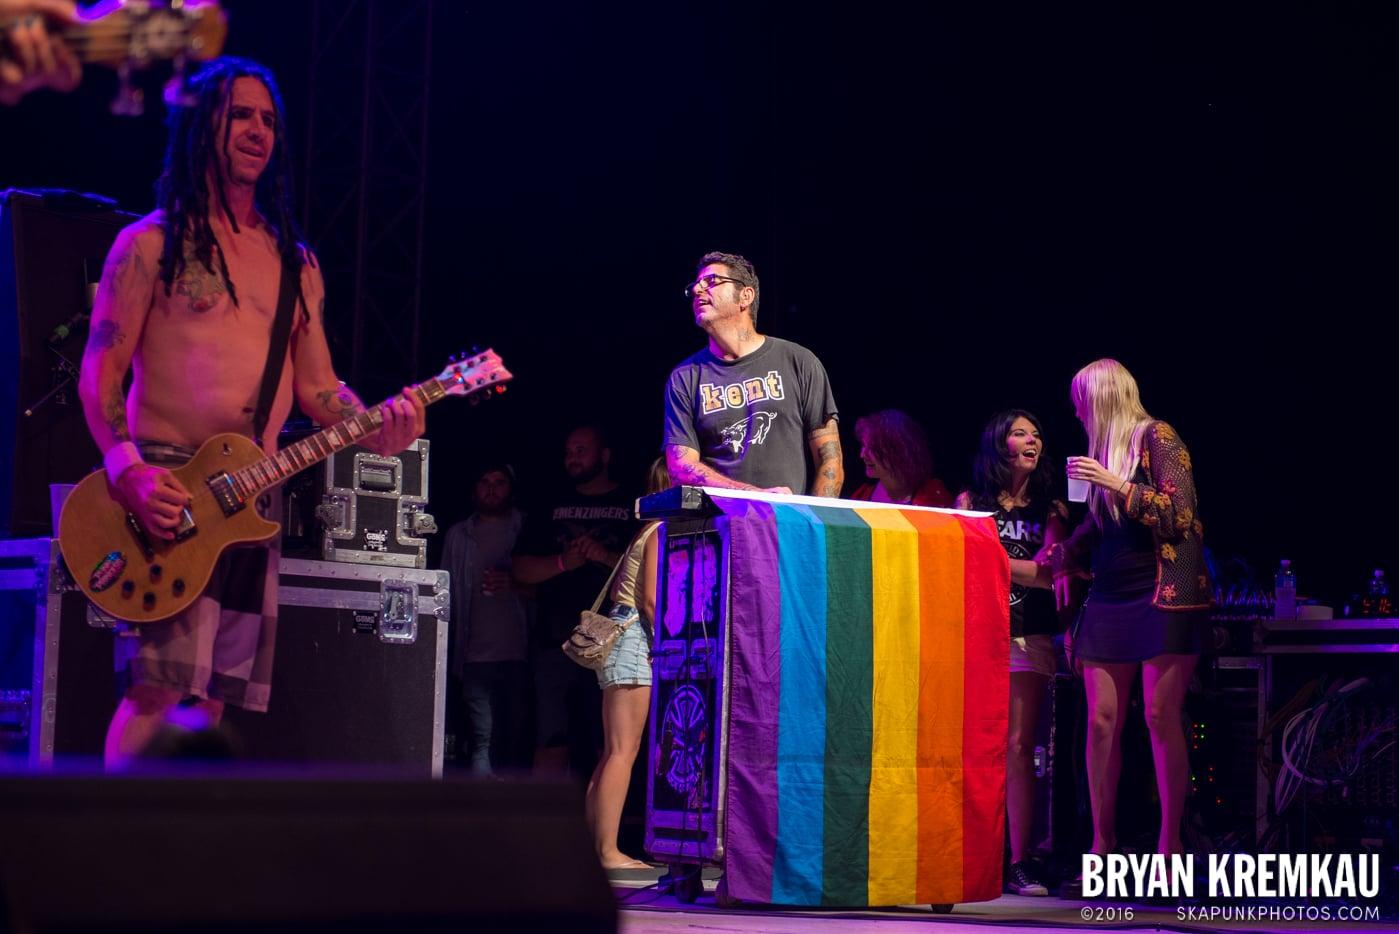 NOFX @ Stone Pony Summer Stage, Asbury Park, NJ - 8.15.15 (42)